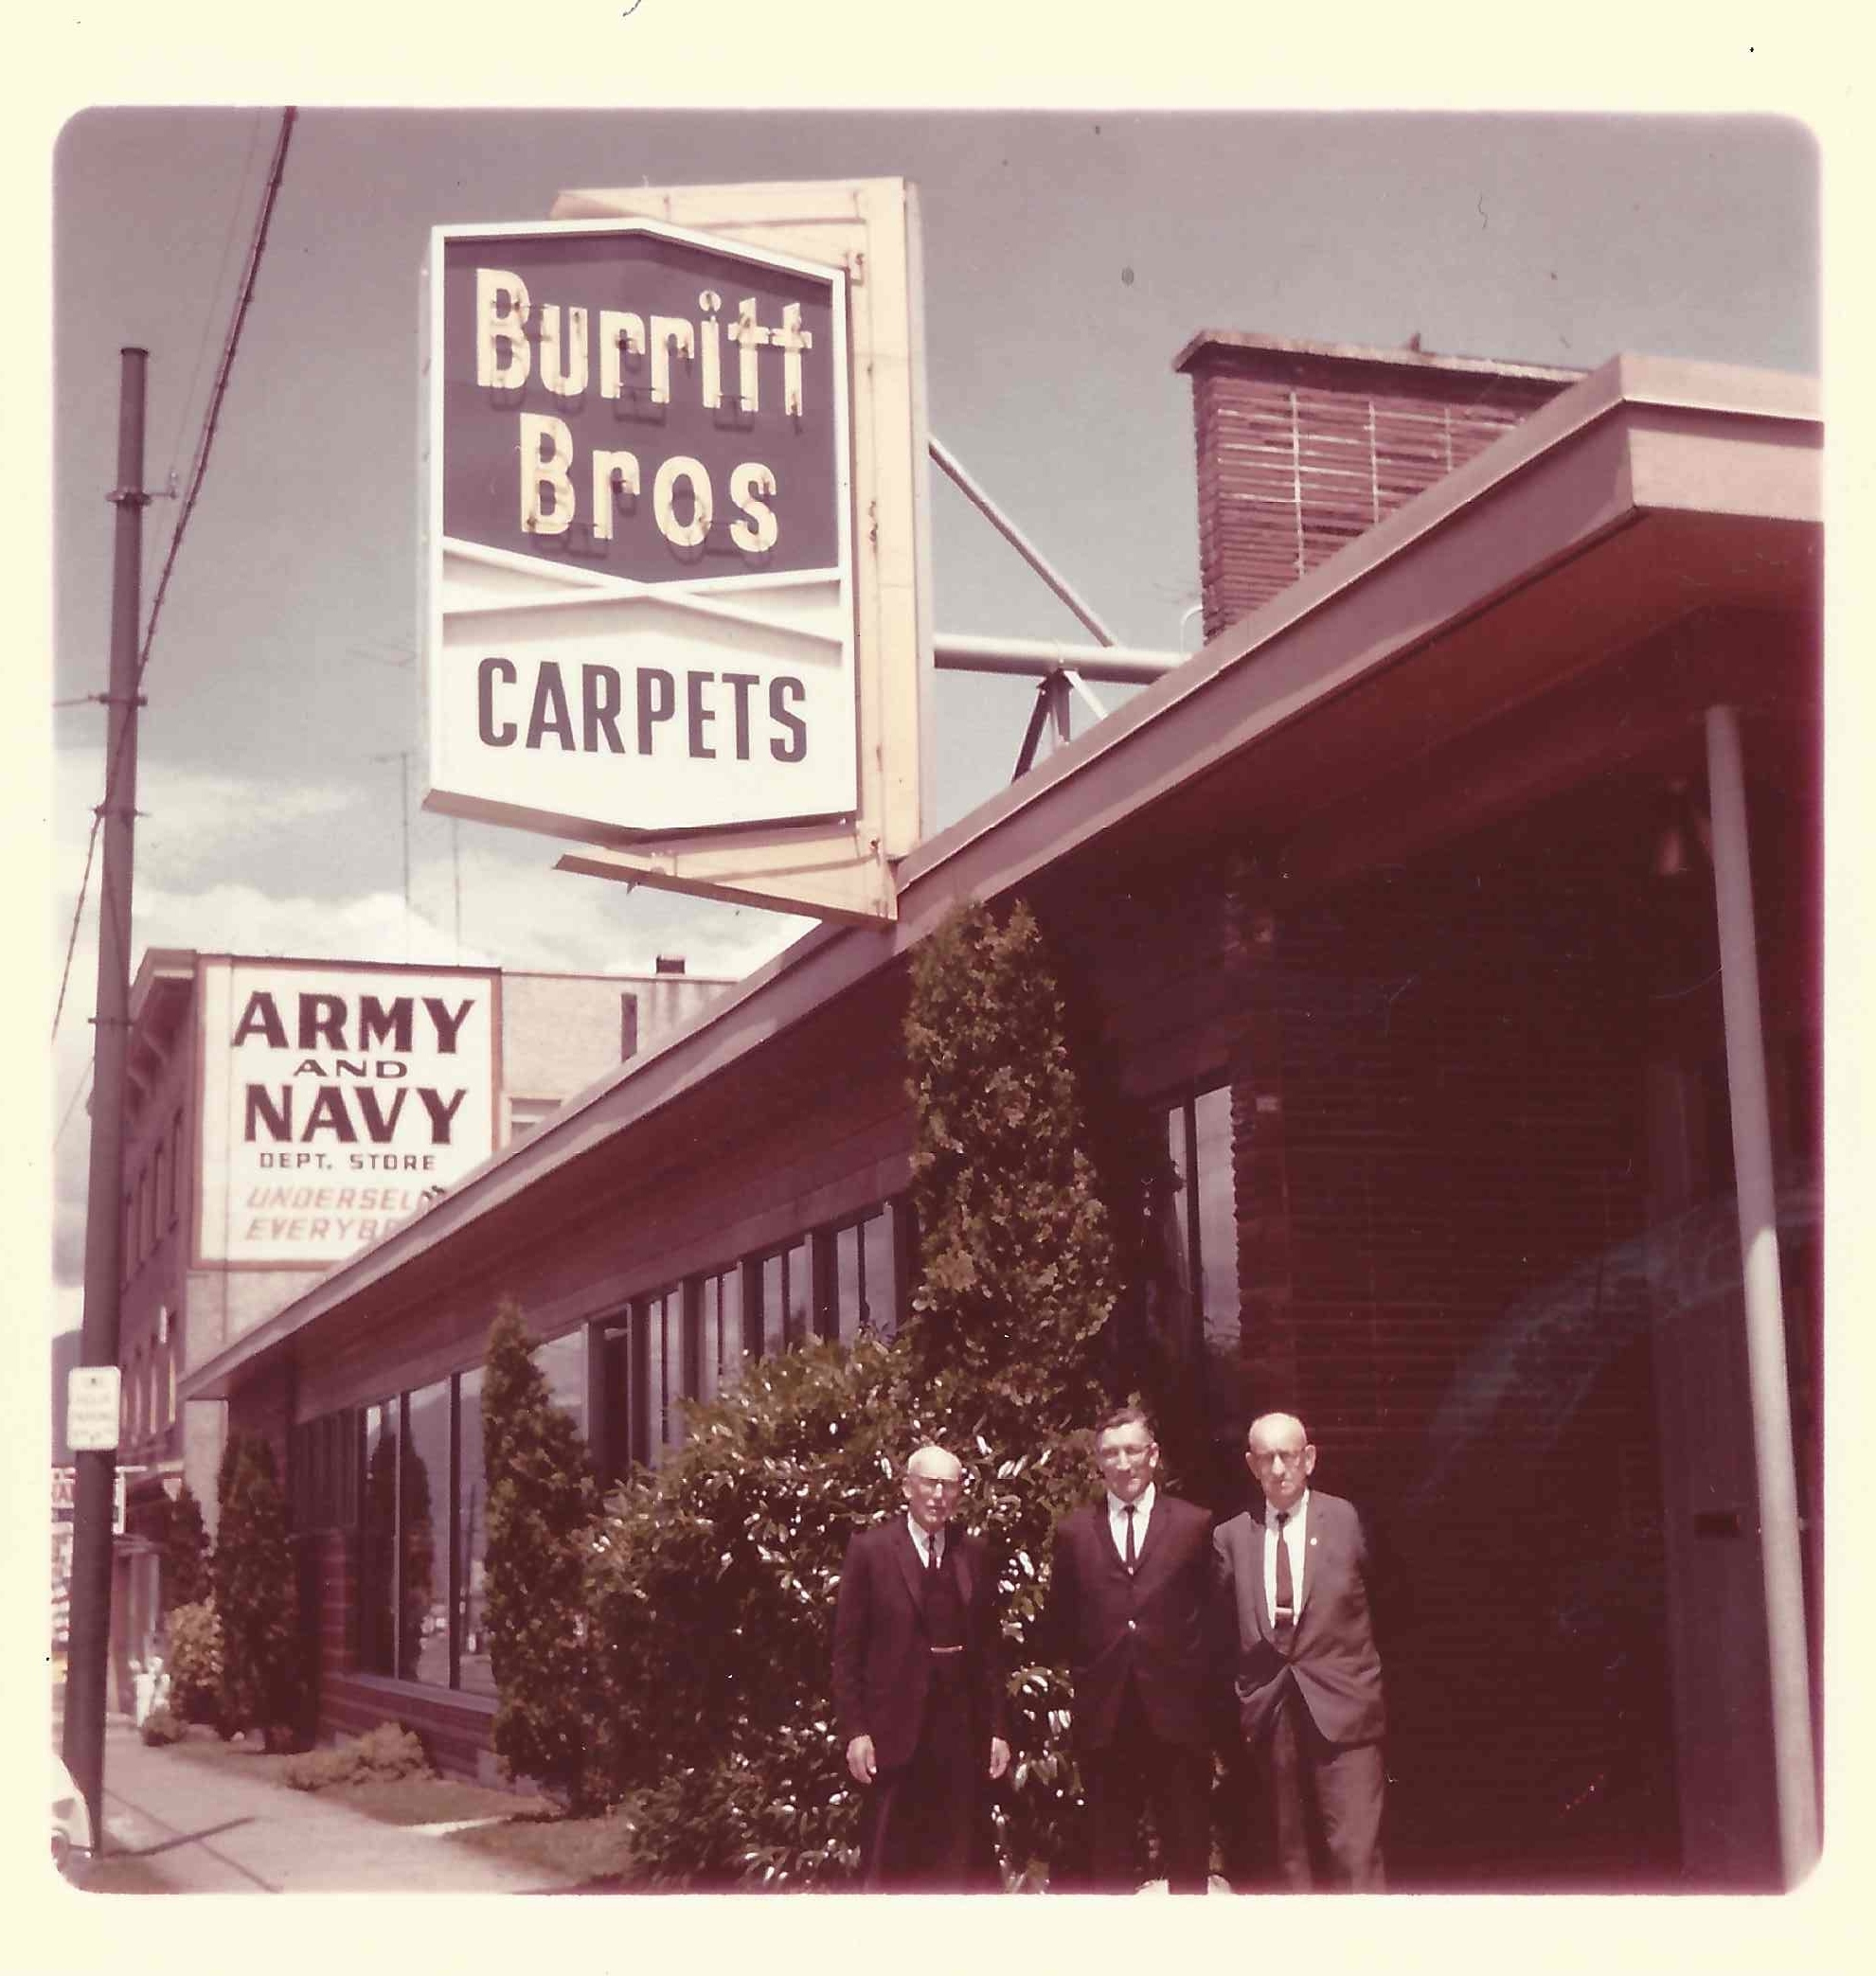 Burritt Bros.' Main Street shop, 1967 - 2016